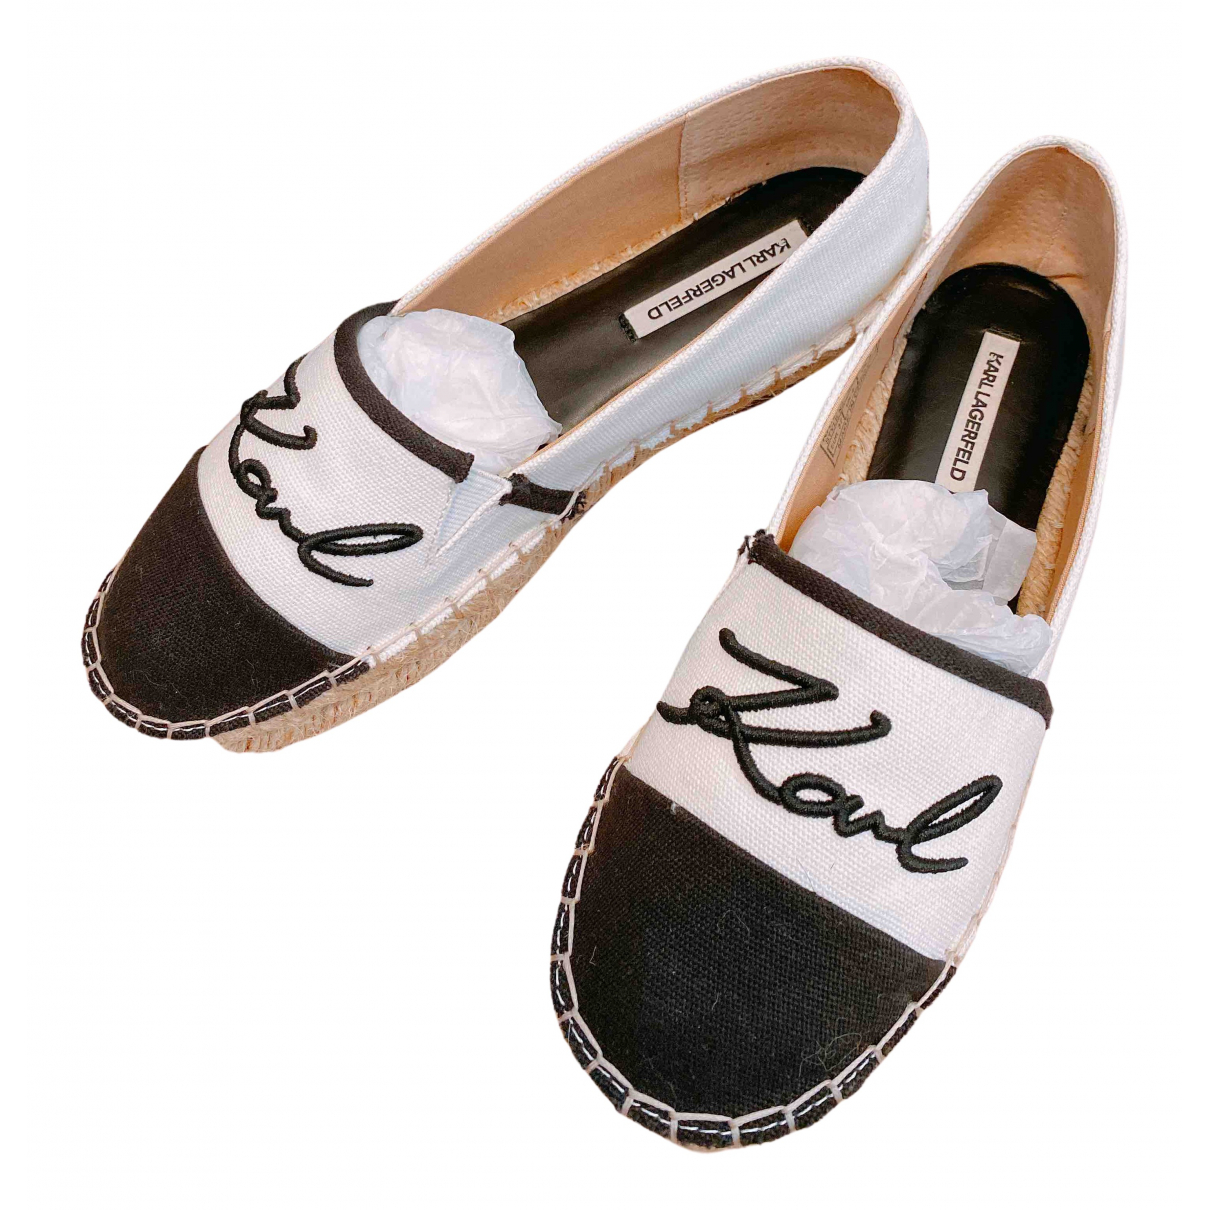 Karl Lagerfeld N Cloth Sandals for Women 37 EU